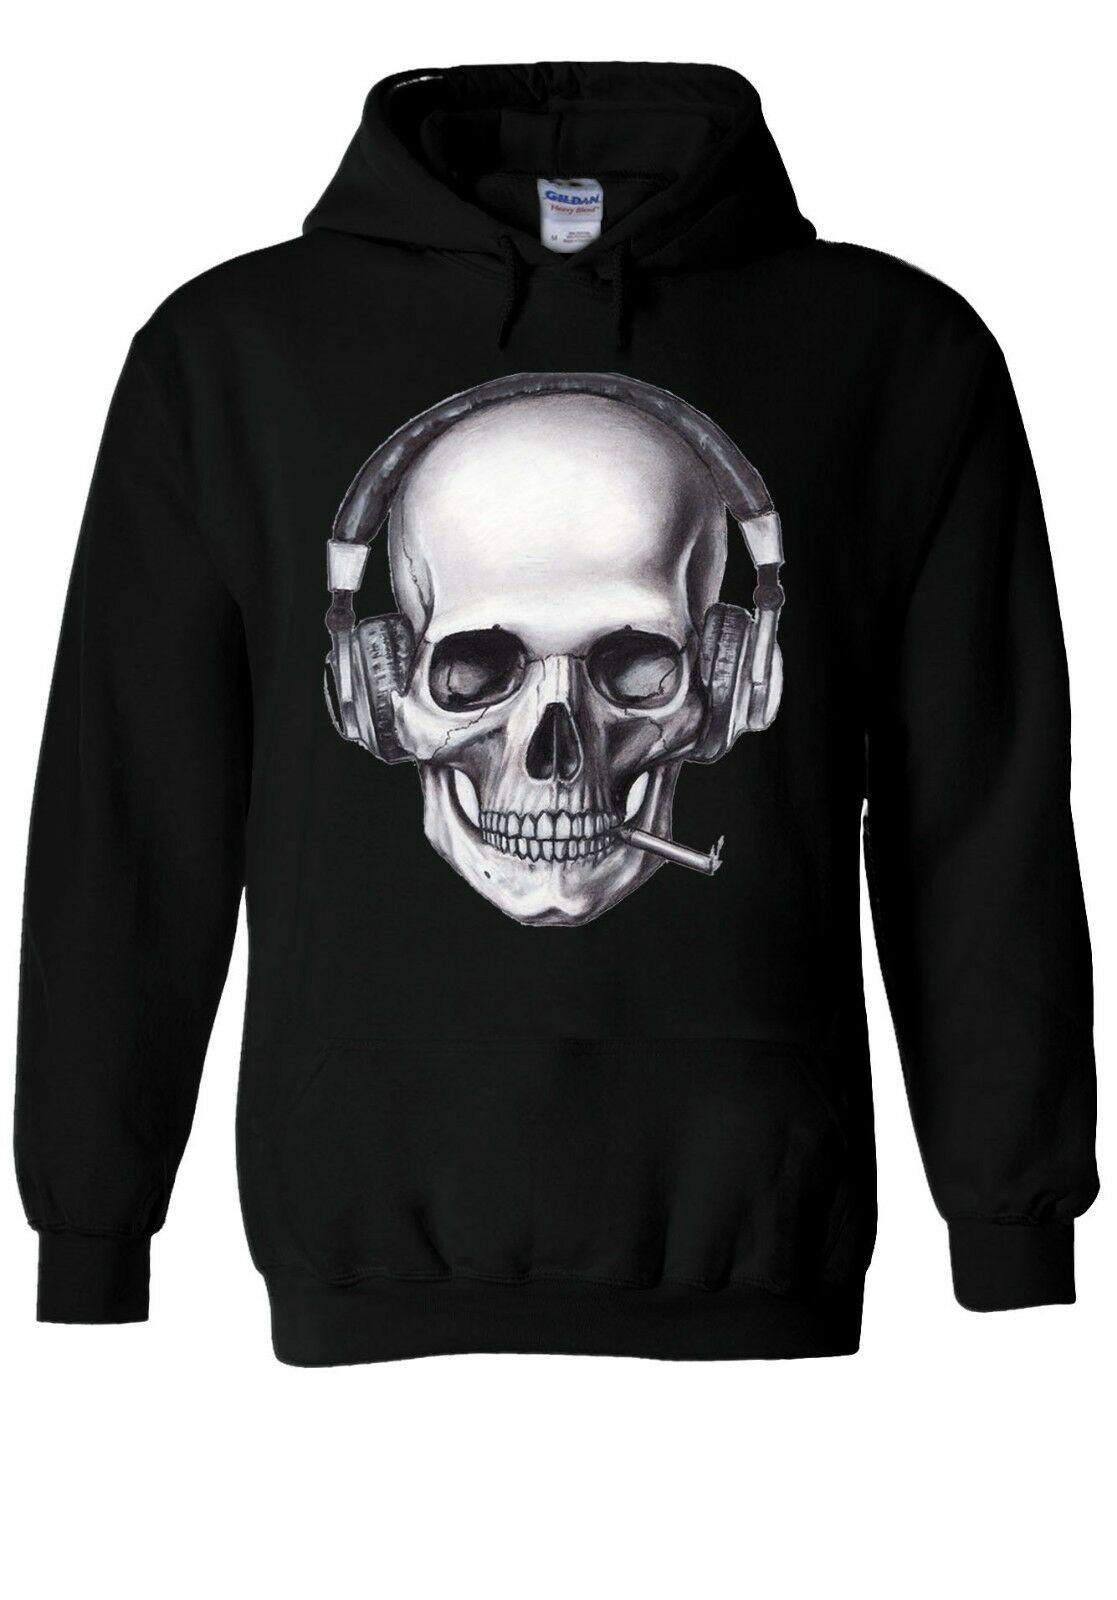 DJ Skeleton Skull Smoking Music Hoodie Sweatshirt Jumper Men Women Unisex 1658